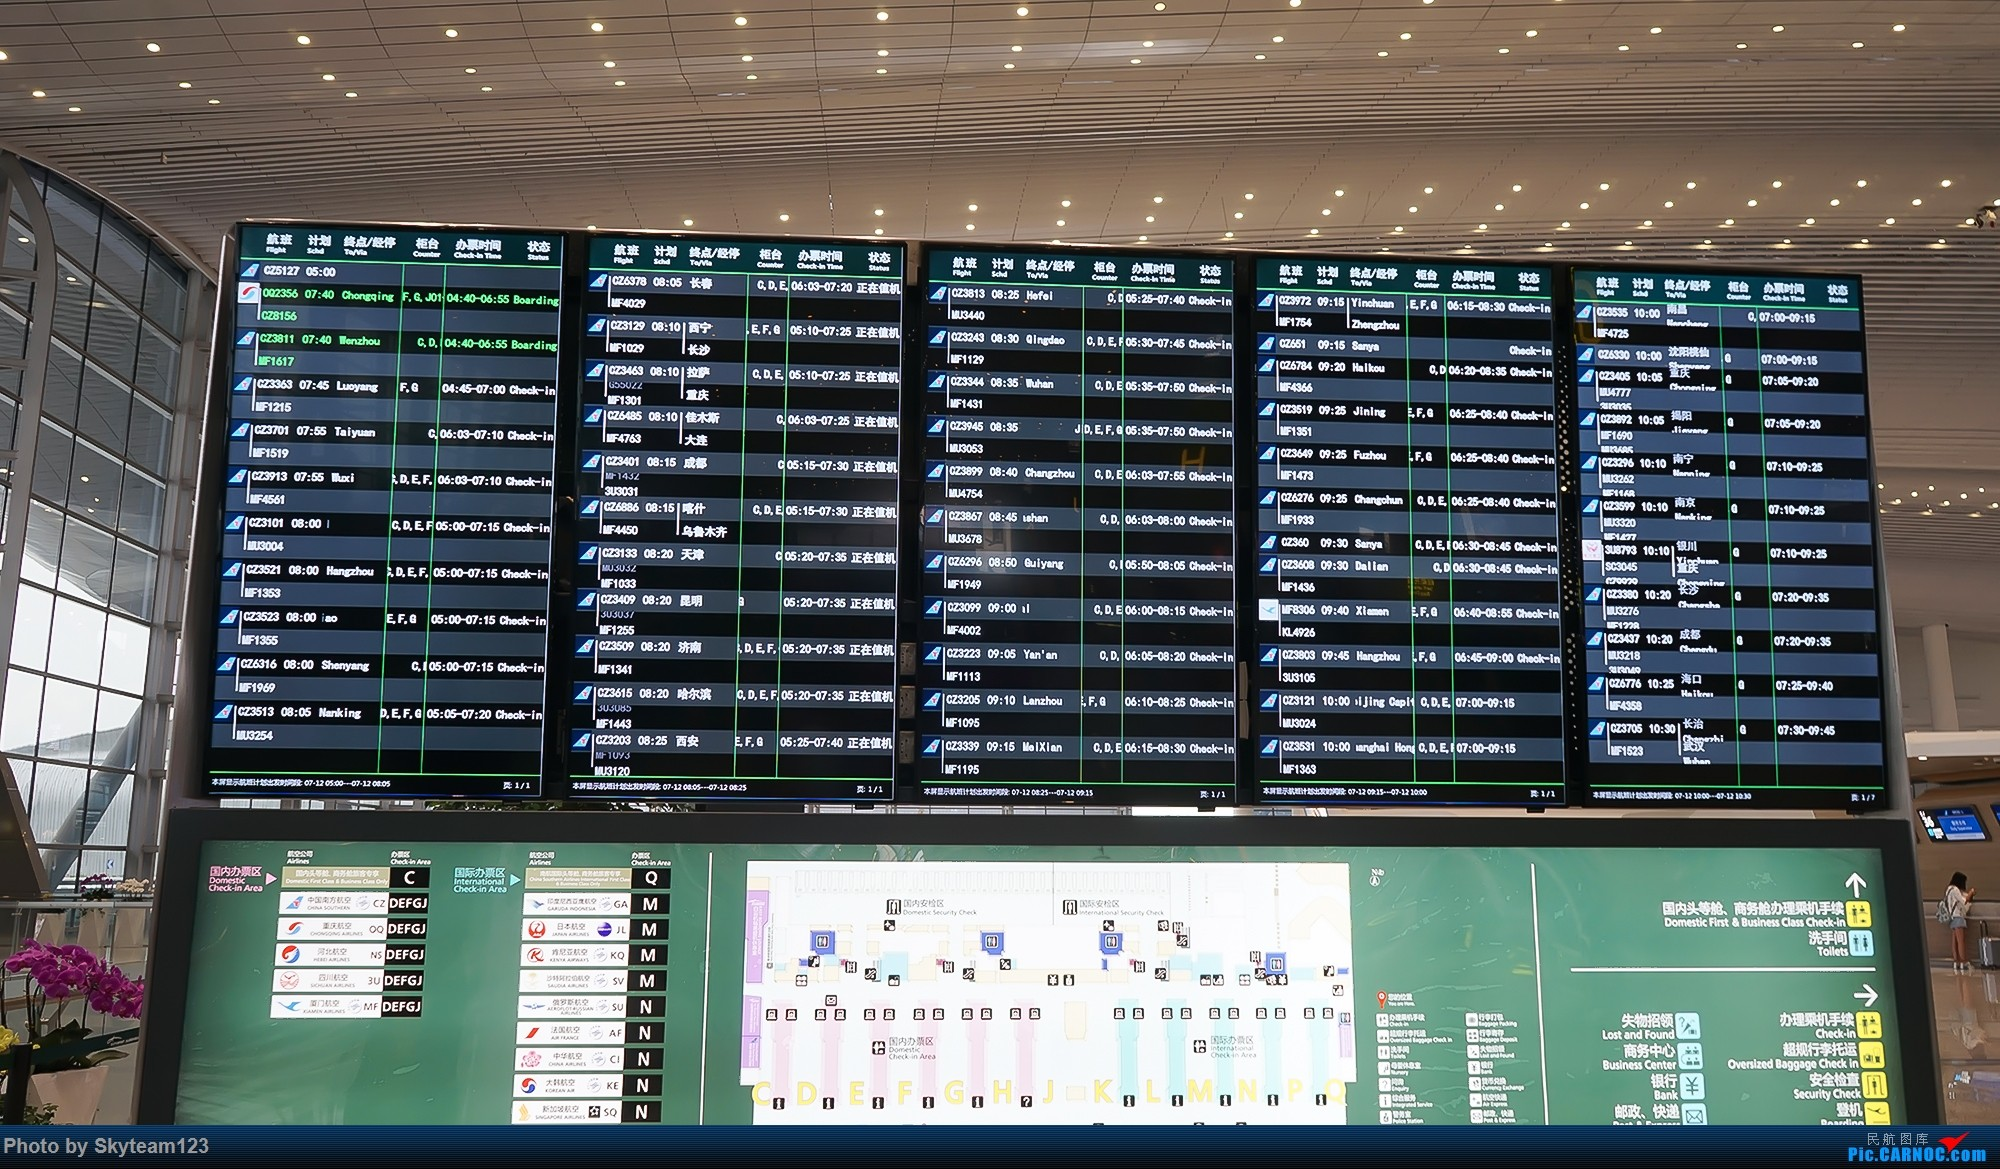 Re:[原创]《Simon游记》第六季第八集 CZ3101&CZ3000 南航全新波音78W经济舱体验&详细测评 PEK八卦台烂天拍机 回程A388公务舱记录